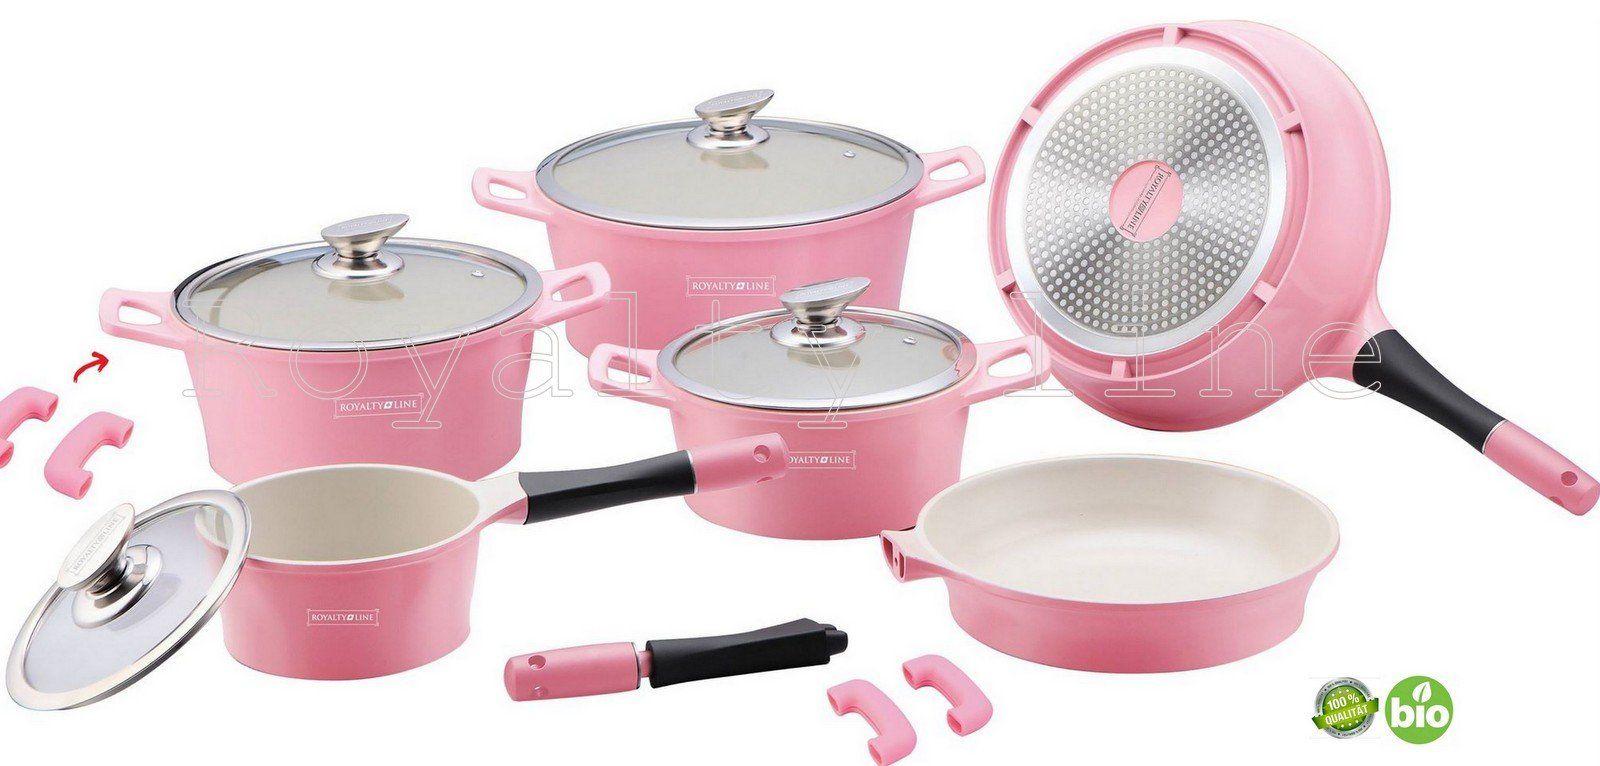 Keramik Kochgeschirr Set 14 Teilig Rosa/pink TV Werbung Royalty Line  Kochtopf